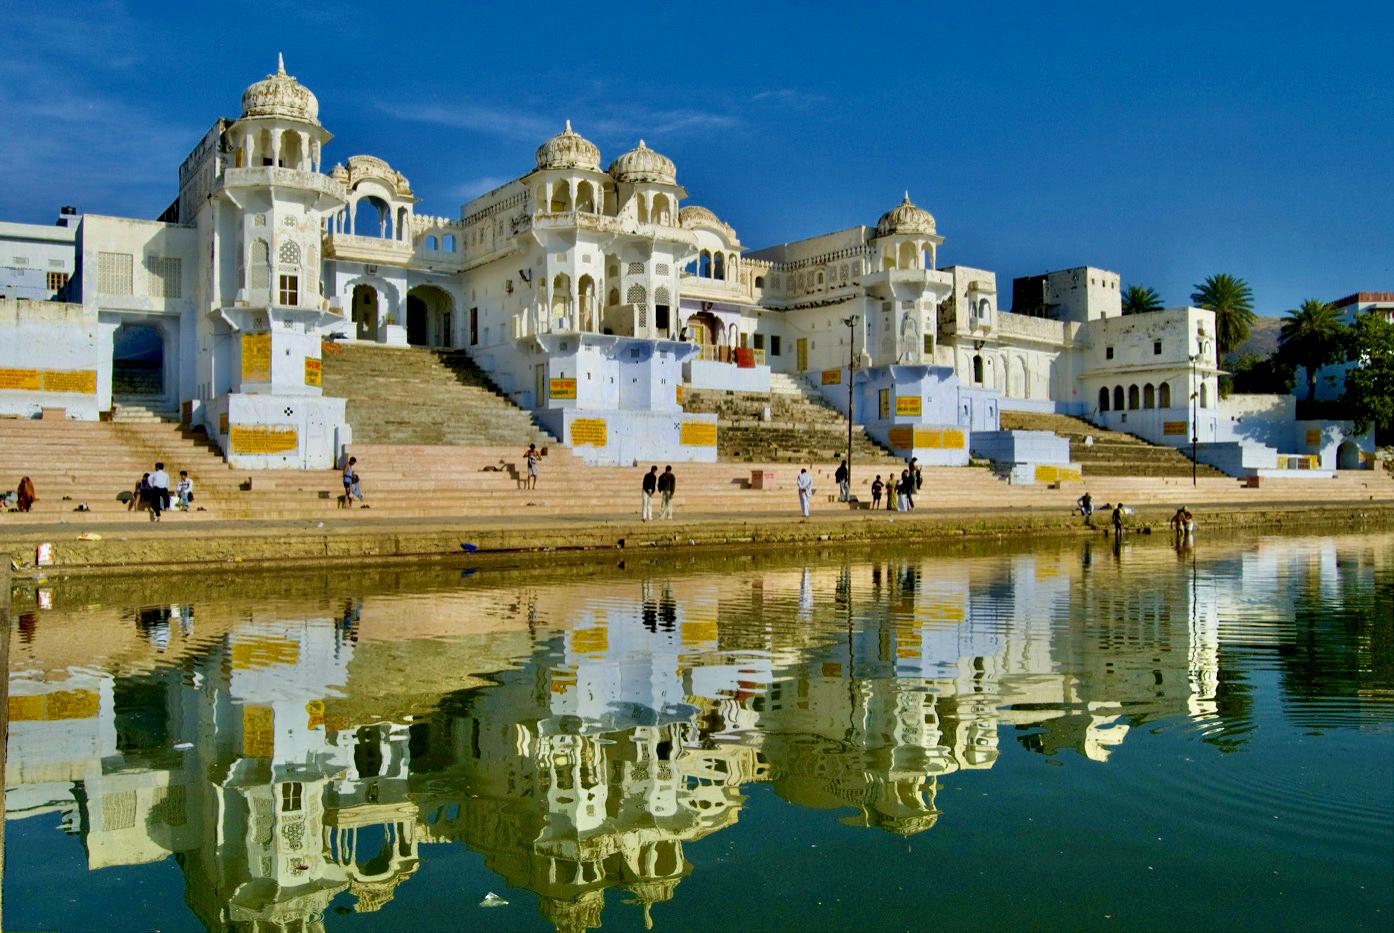 Pushkar Ghats and Temples Rajasthan India